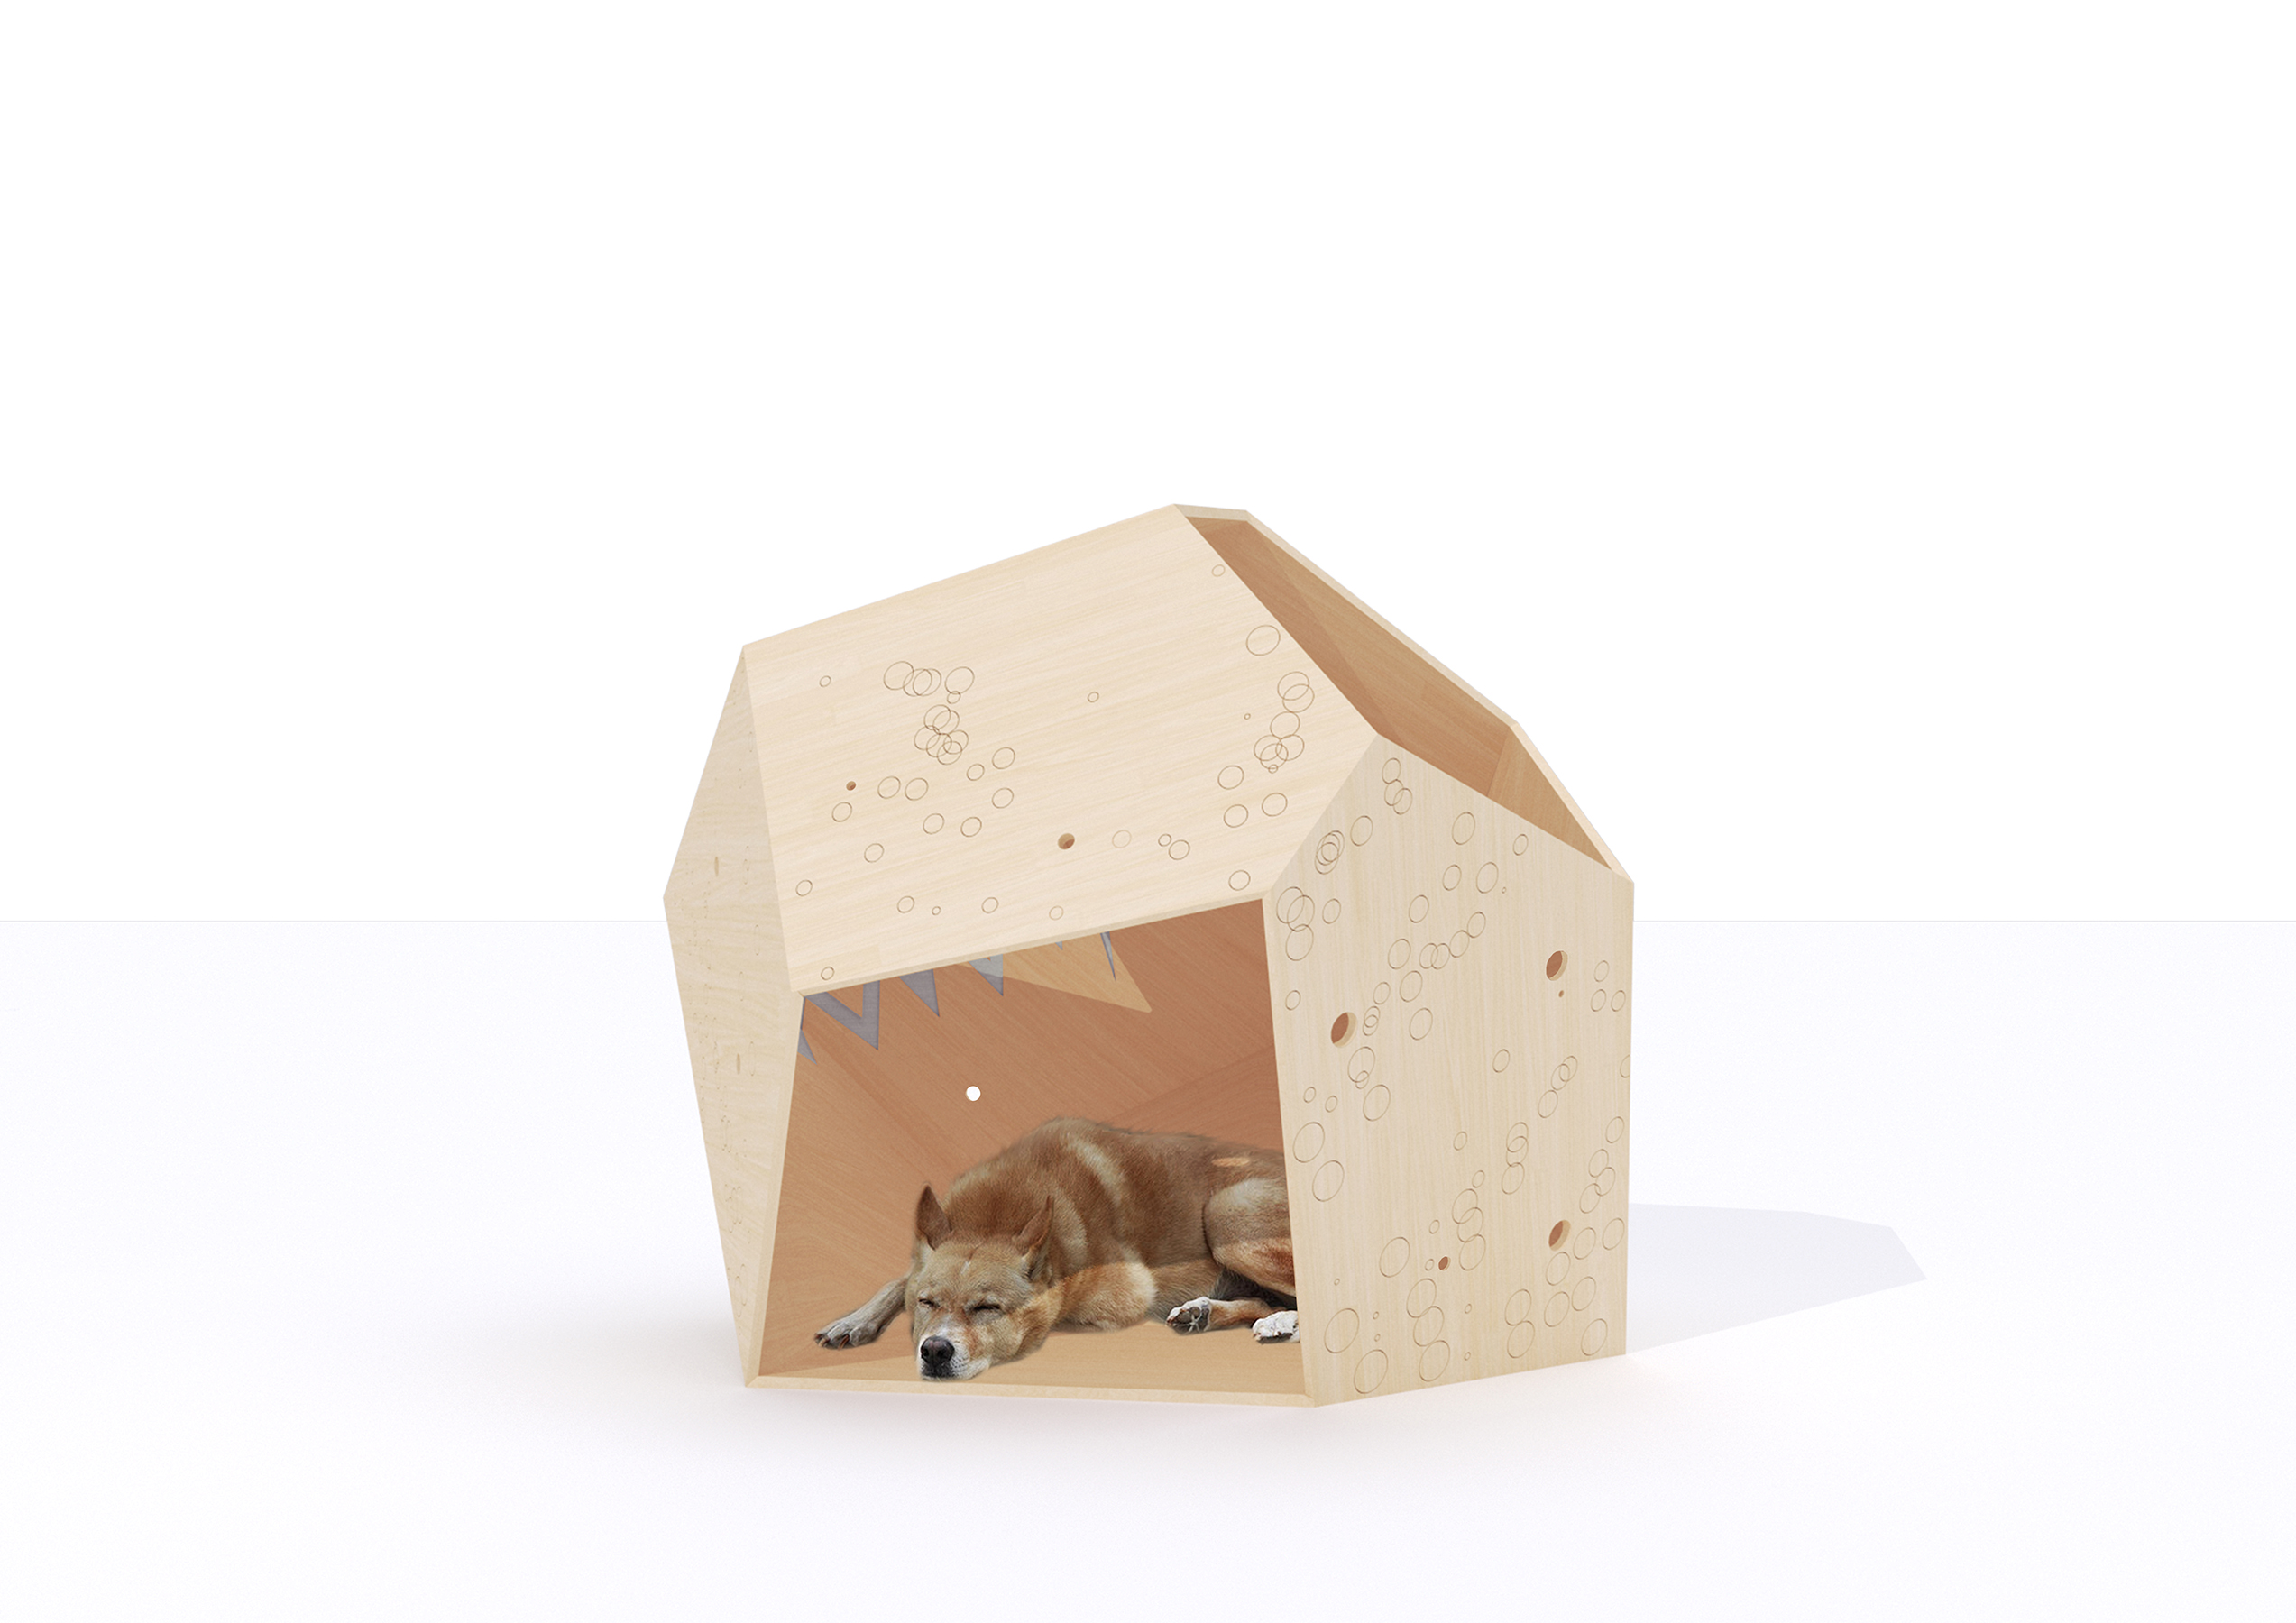 Lot 33 - Pim.studio Architects - PiM.dog